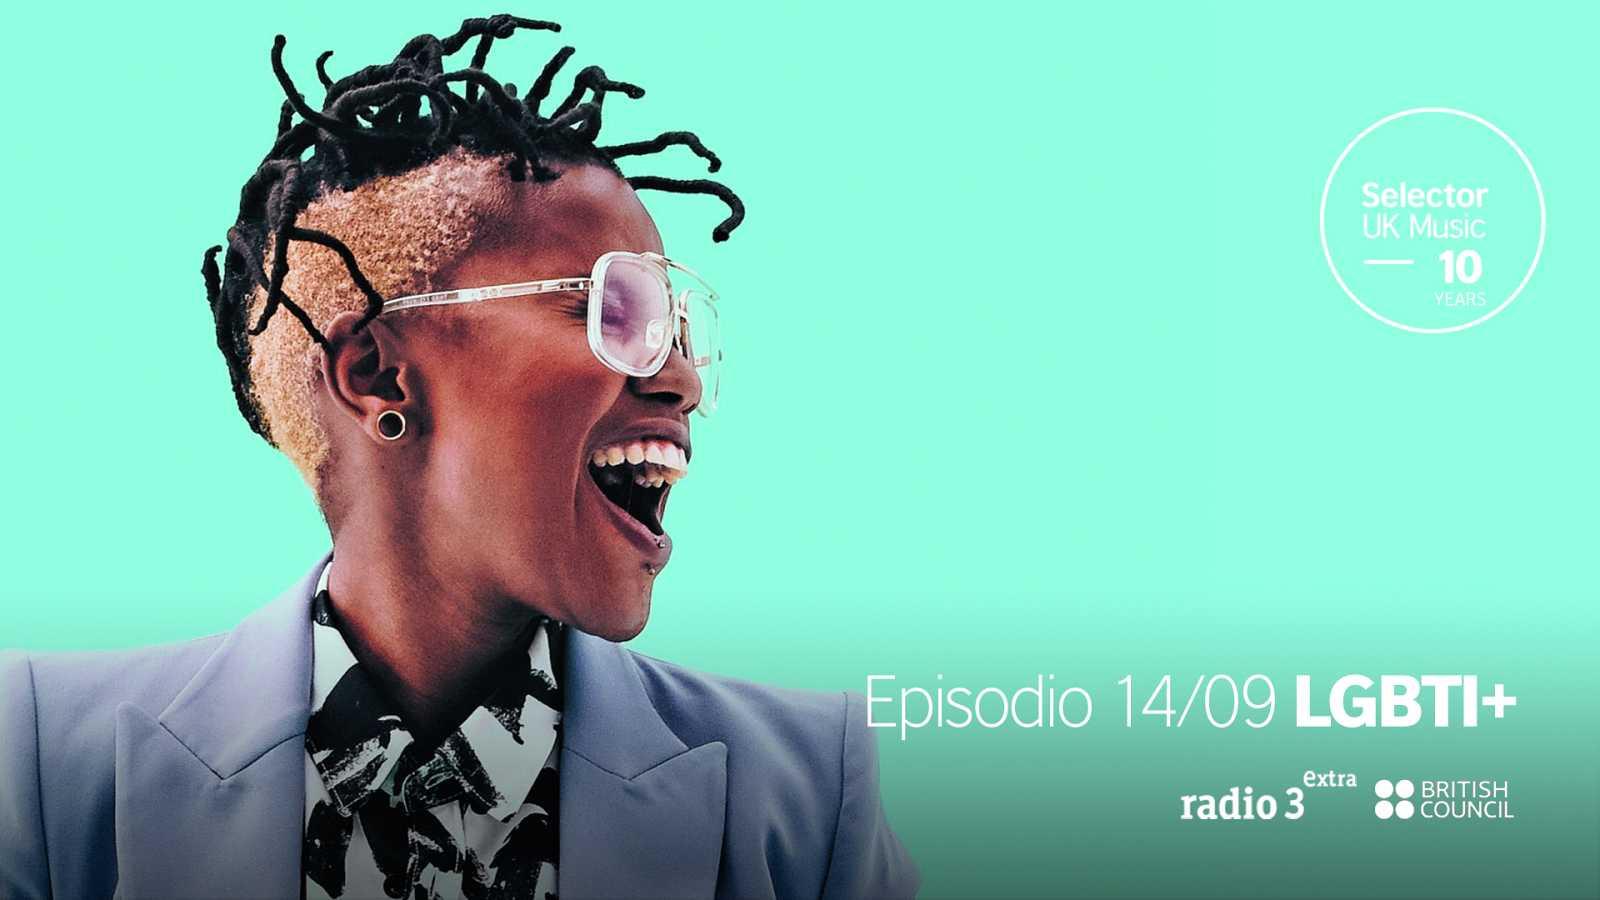 The Selector - LGBTI+ - 14/09/21 - Escuchar ahora